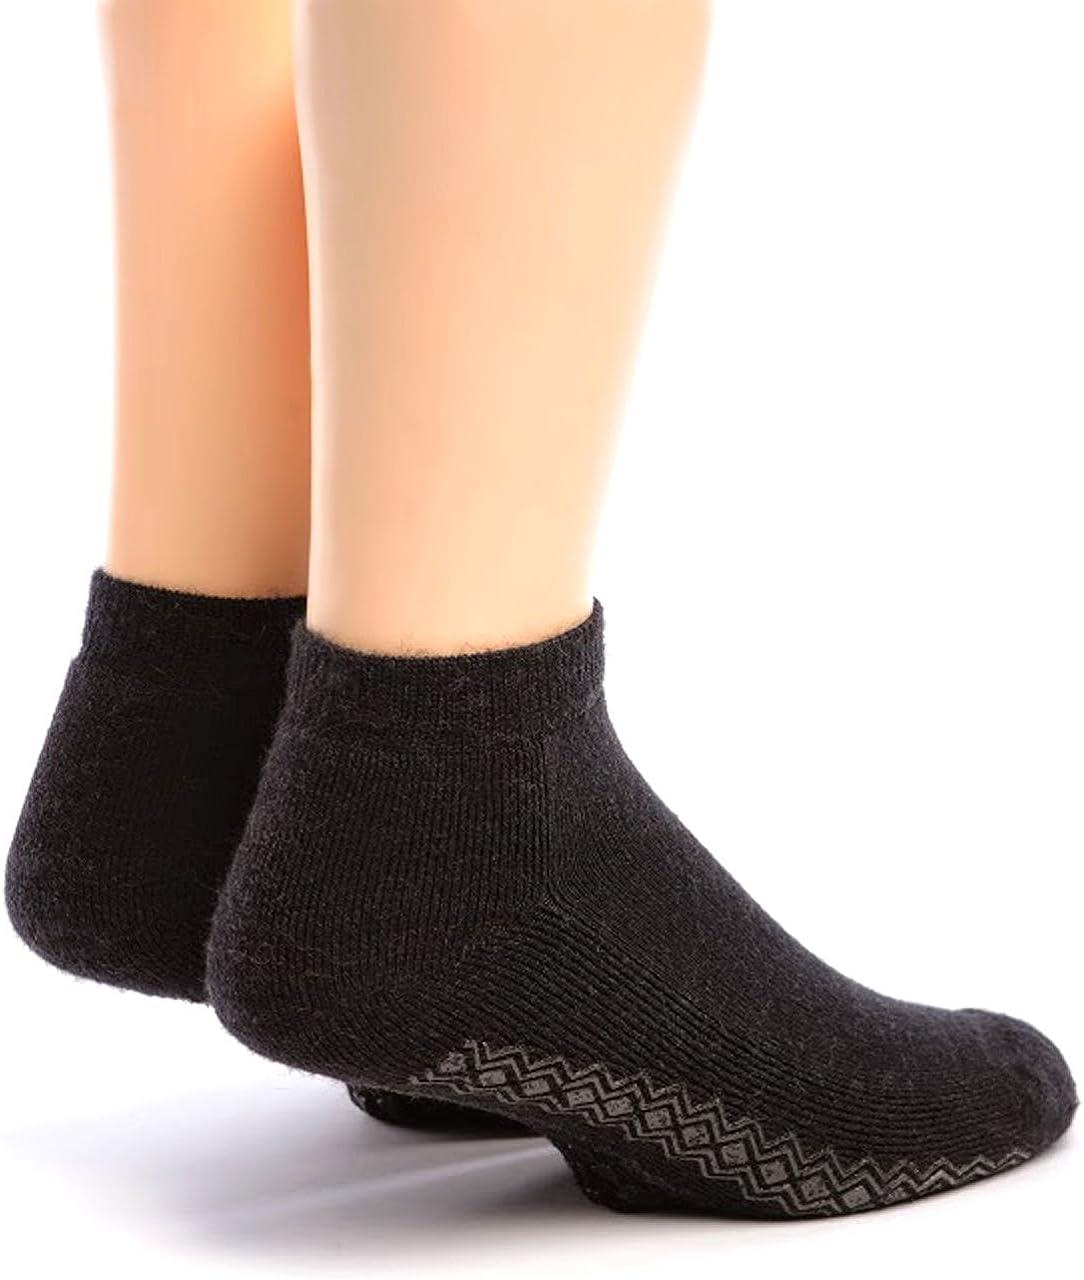 Warrior Alpaca Socks - Boy's Non-Slip Mini Crew Sock Black Small